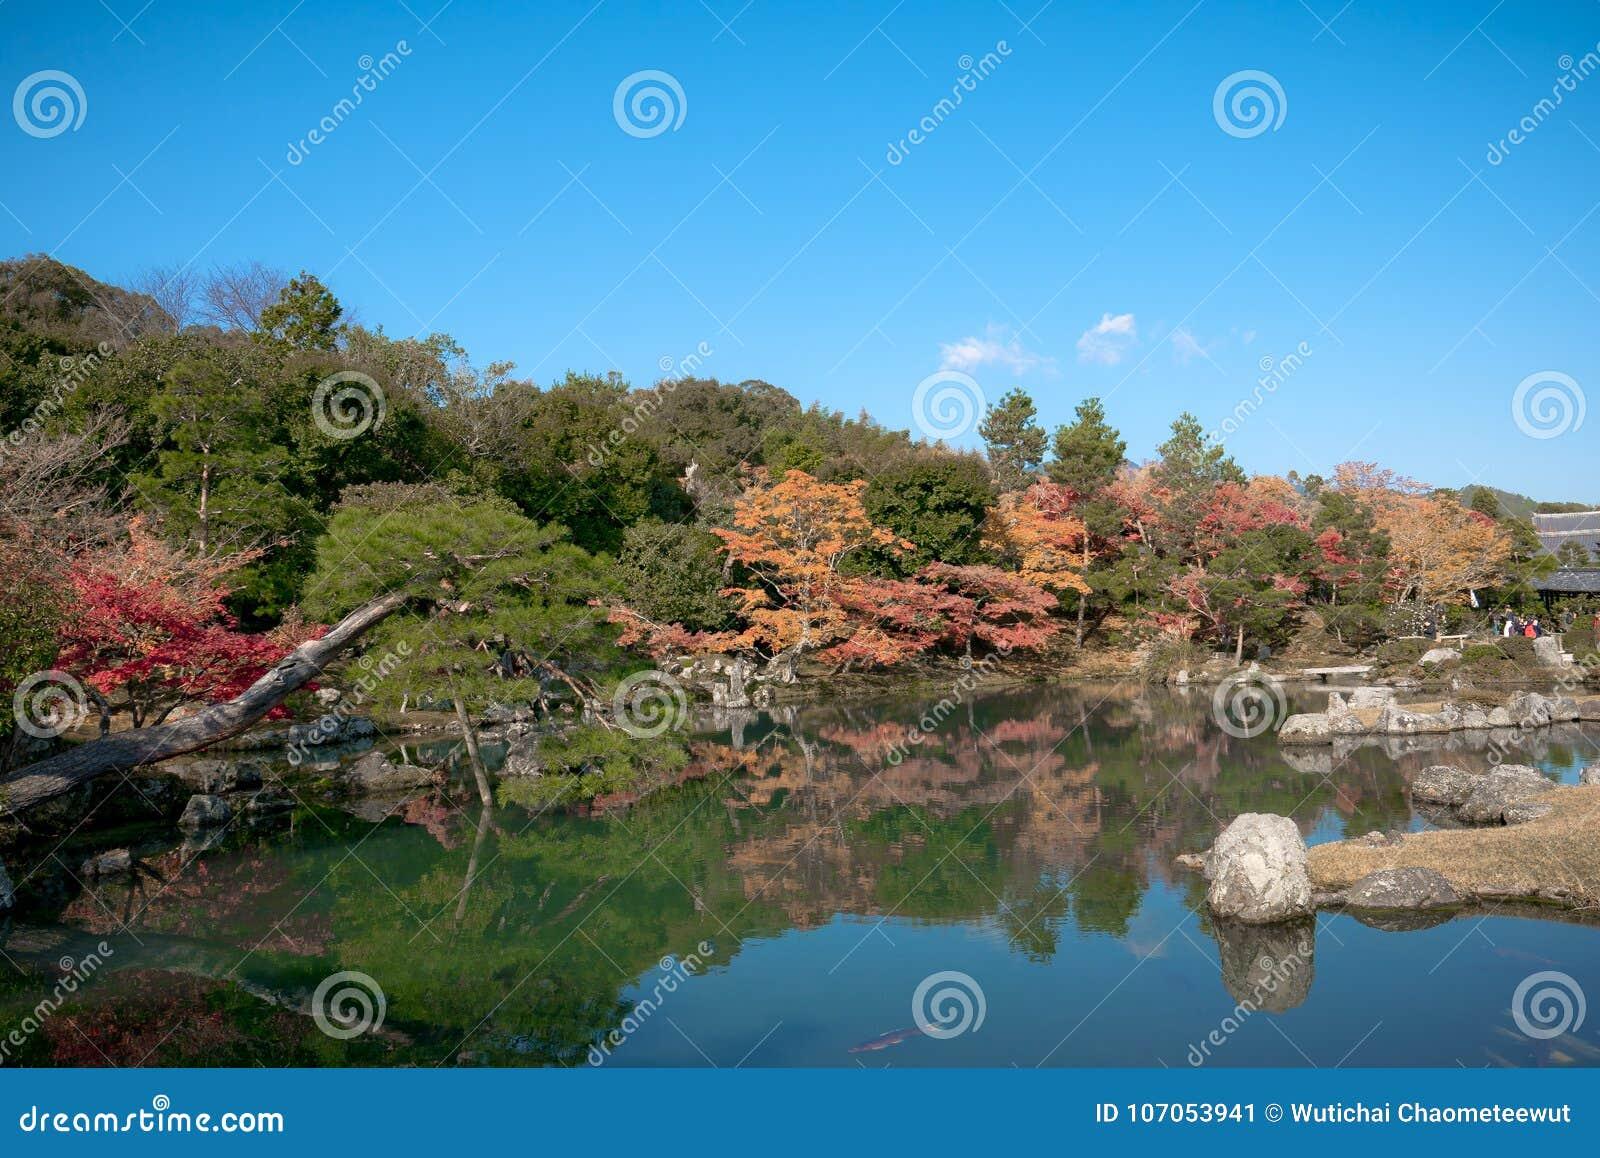 Japanese Zen Garden, Autumn Kyoto Stock Image - Image of natural ...